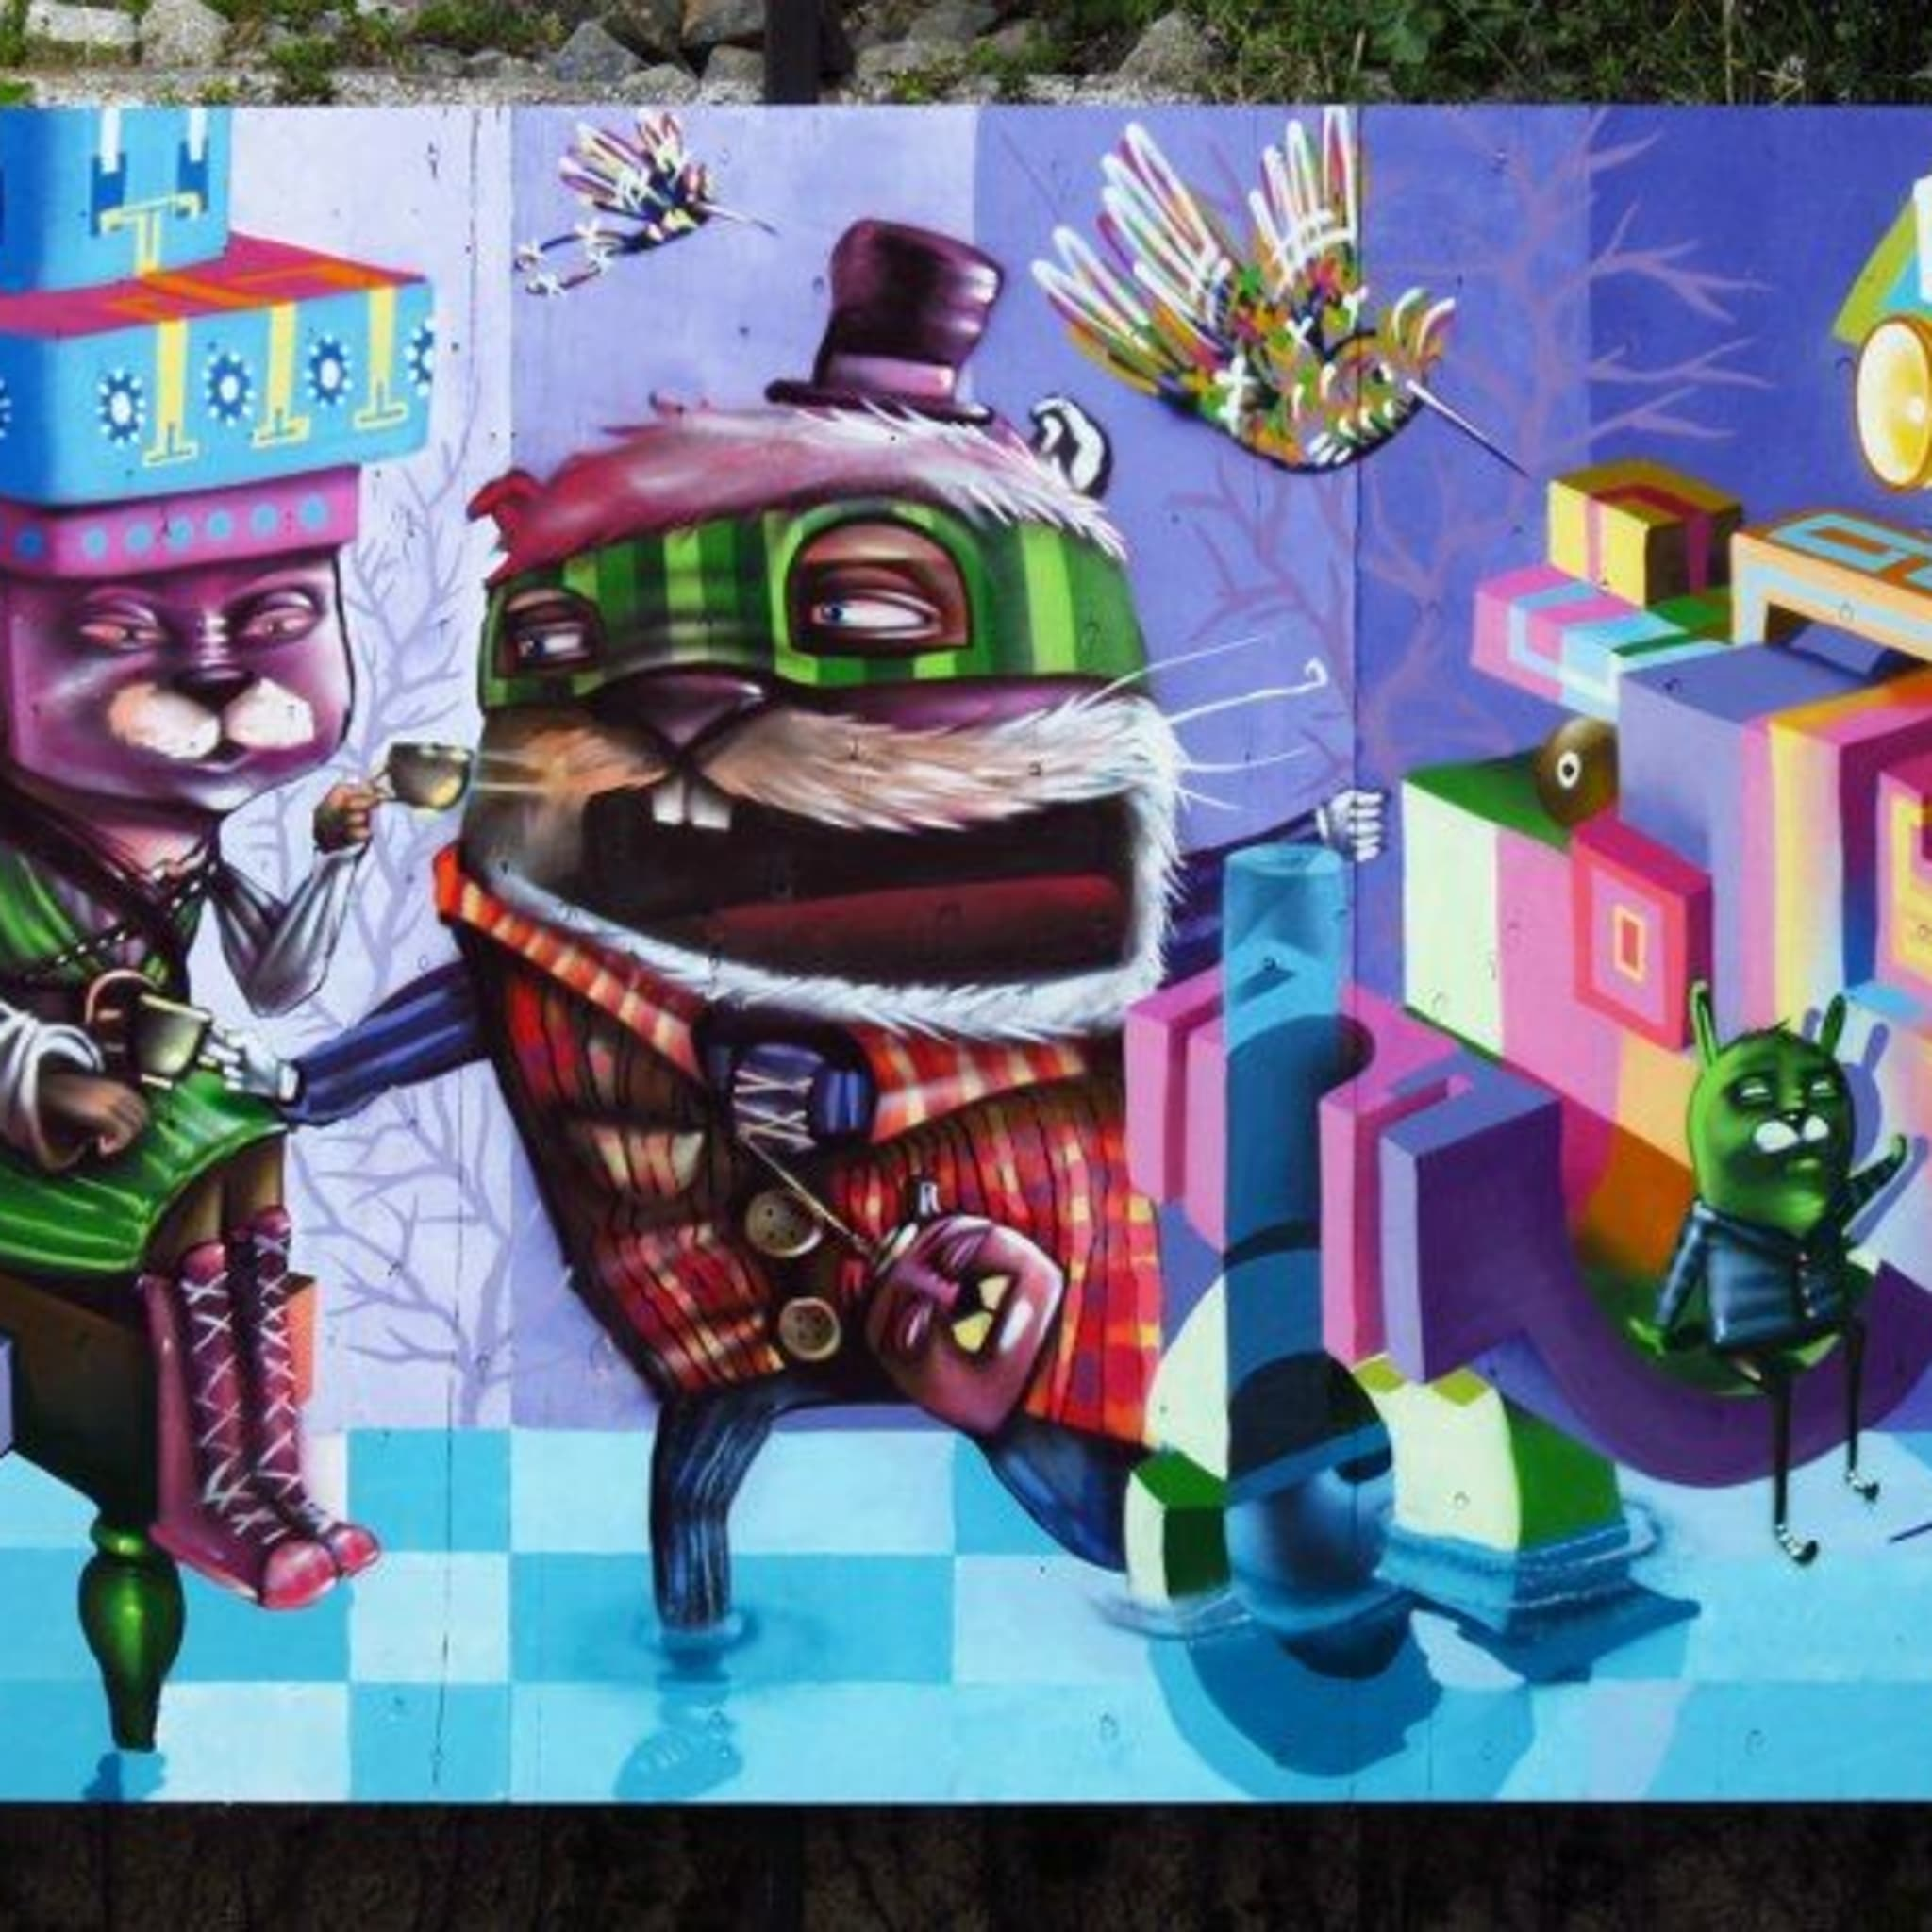 Œuvre Par Sebastian Navarro - Charquipunk, Painters à Valparaíso